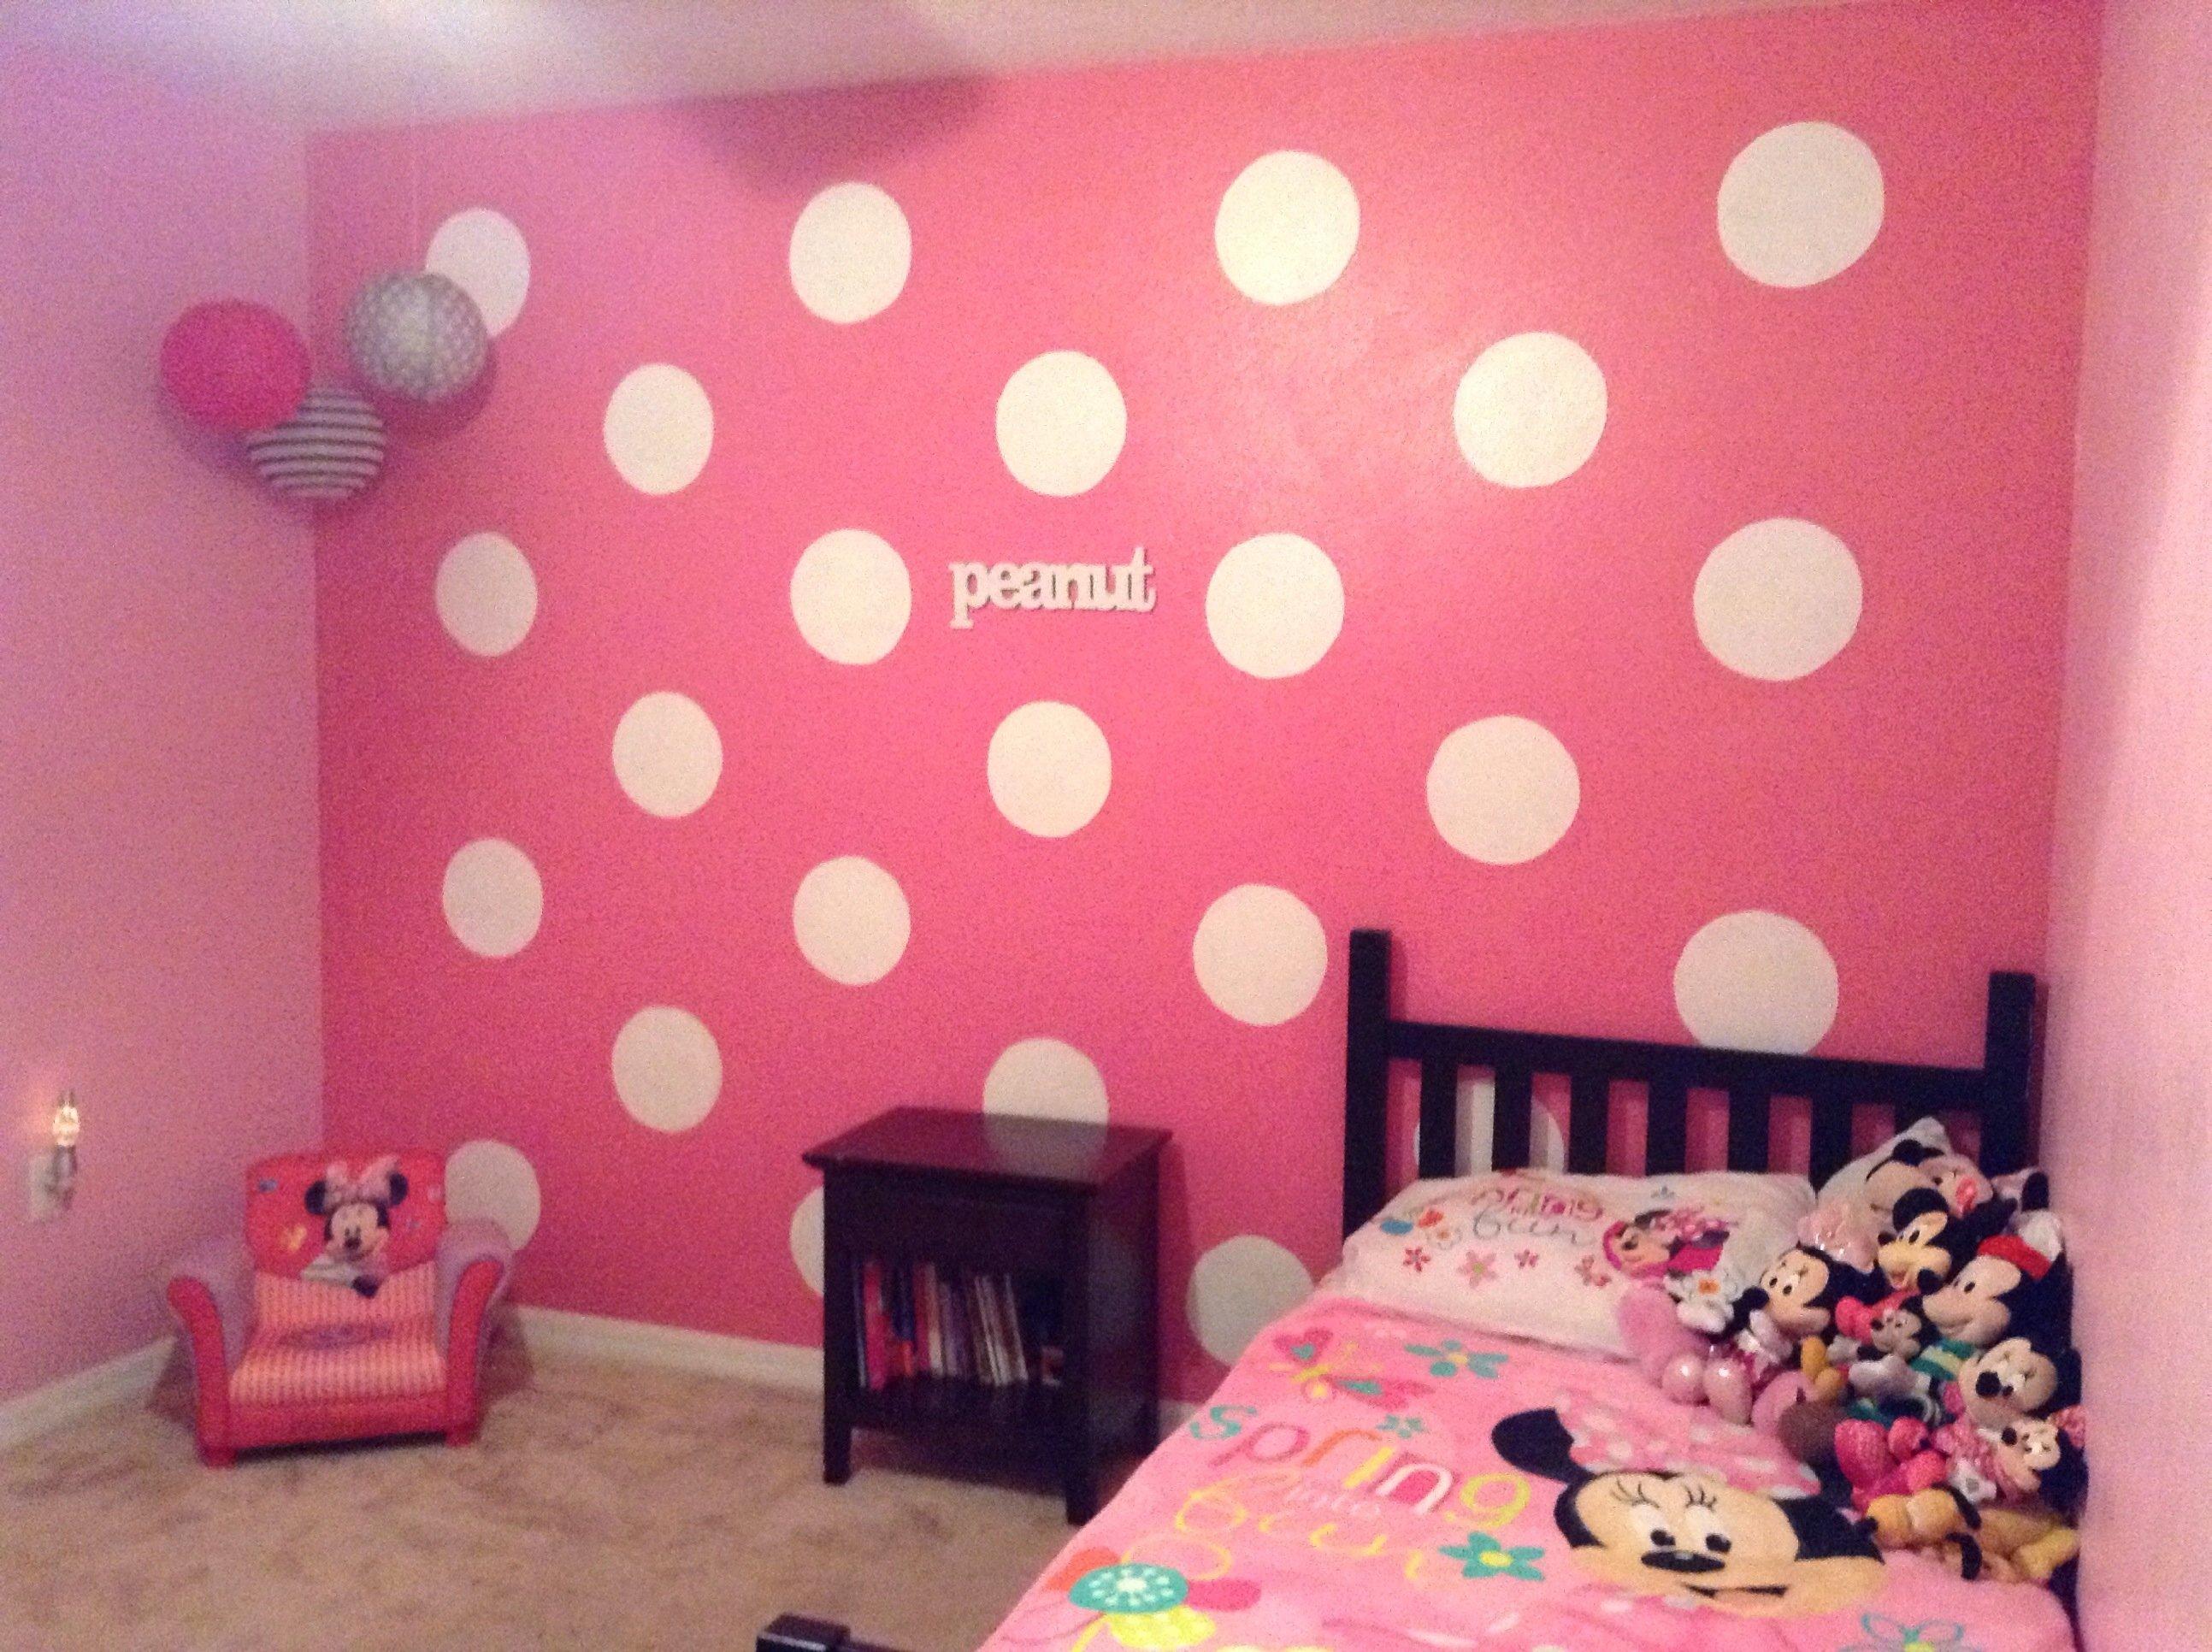 10 Stylish Minnie Mouse Room Decor Ideas decorations minnie mouse room decor with mickey bedroom set pink 2020